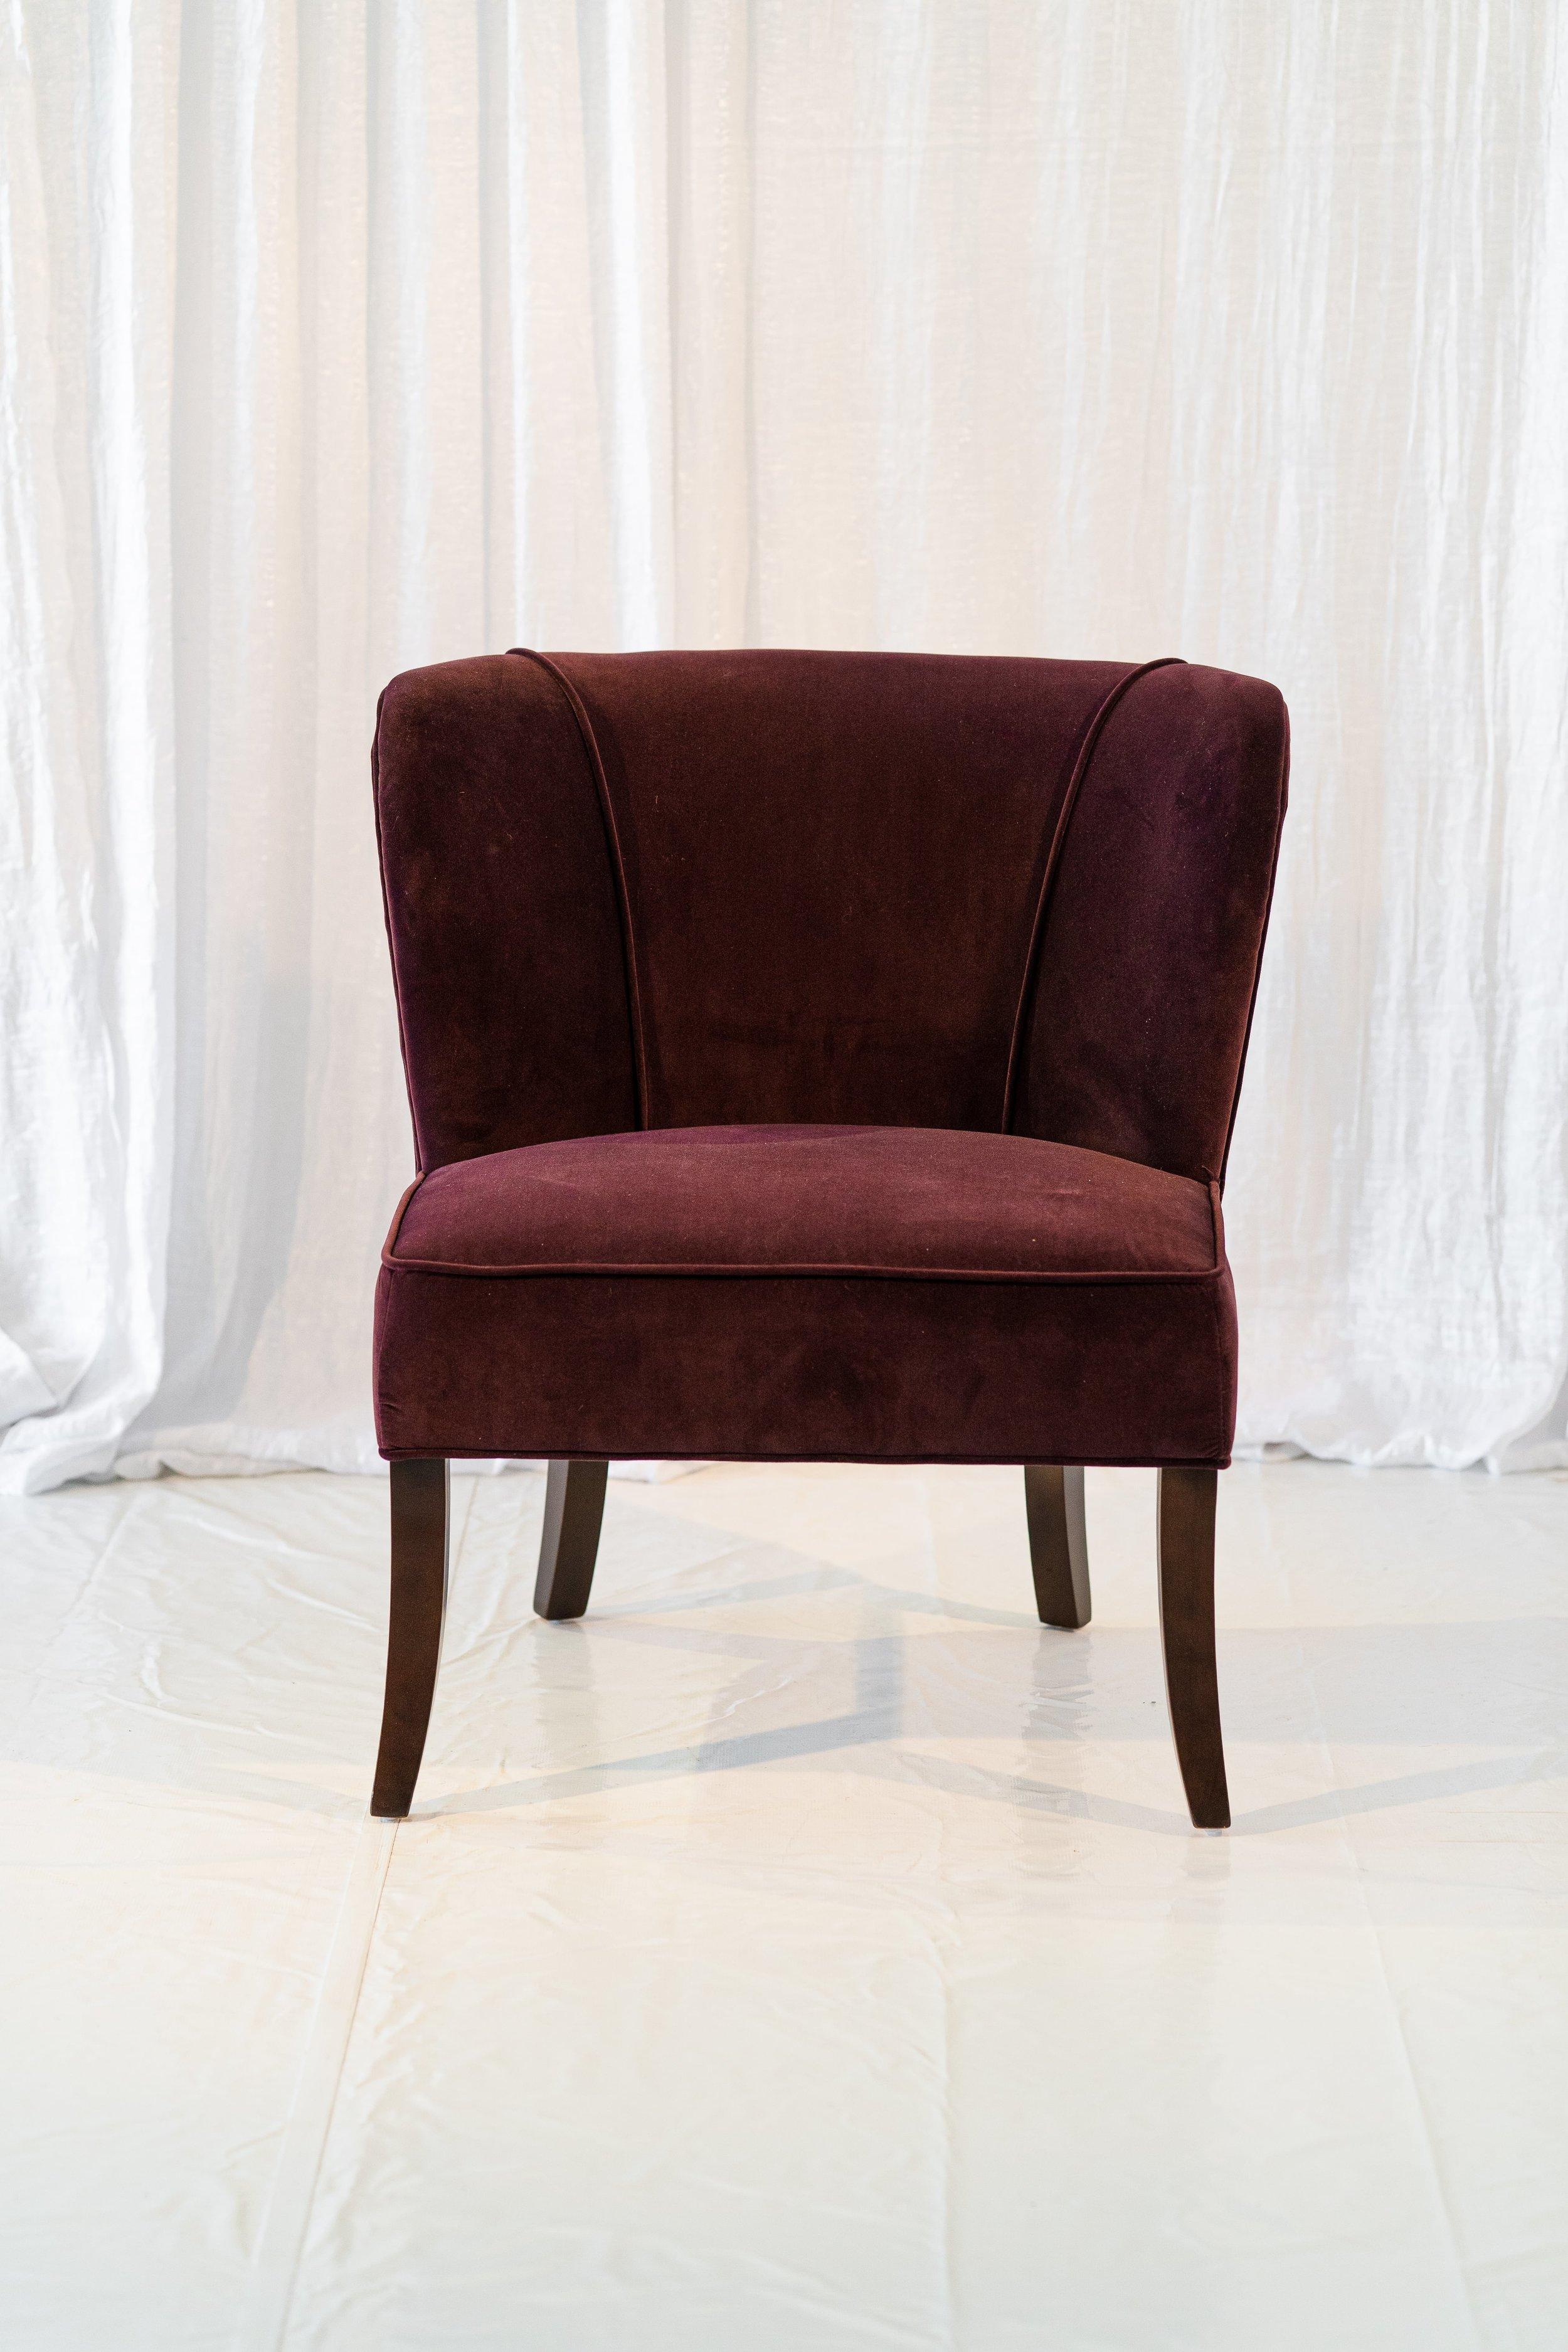 vintage chair images2-9-min.jpg